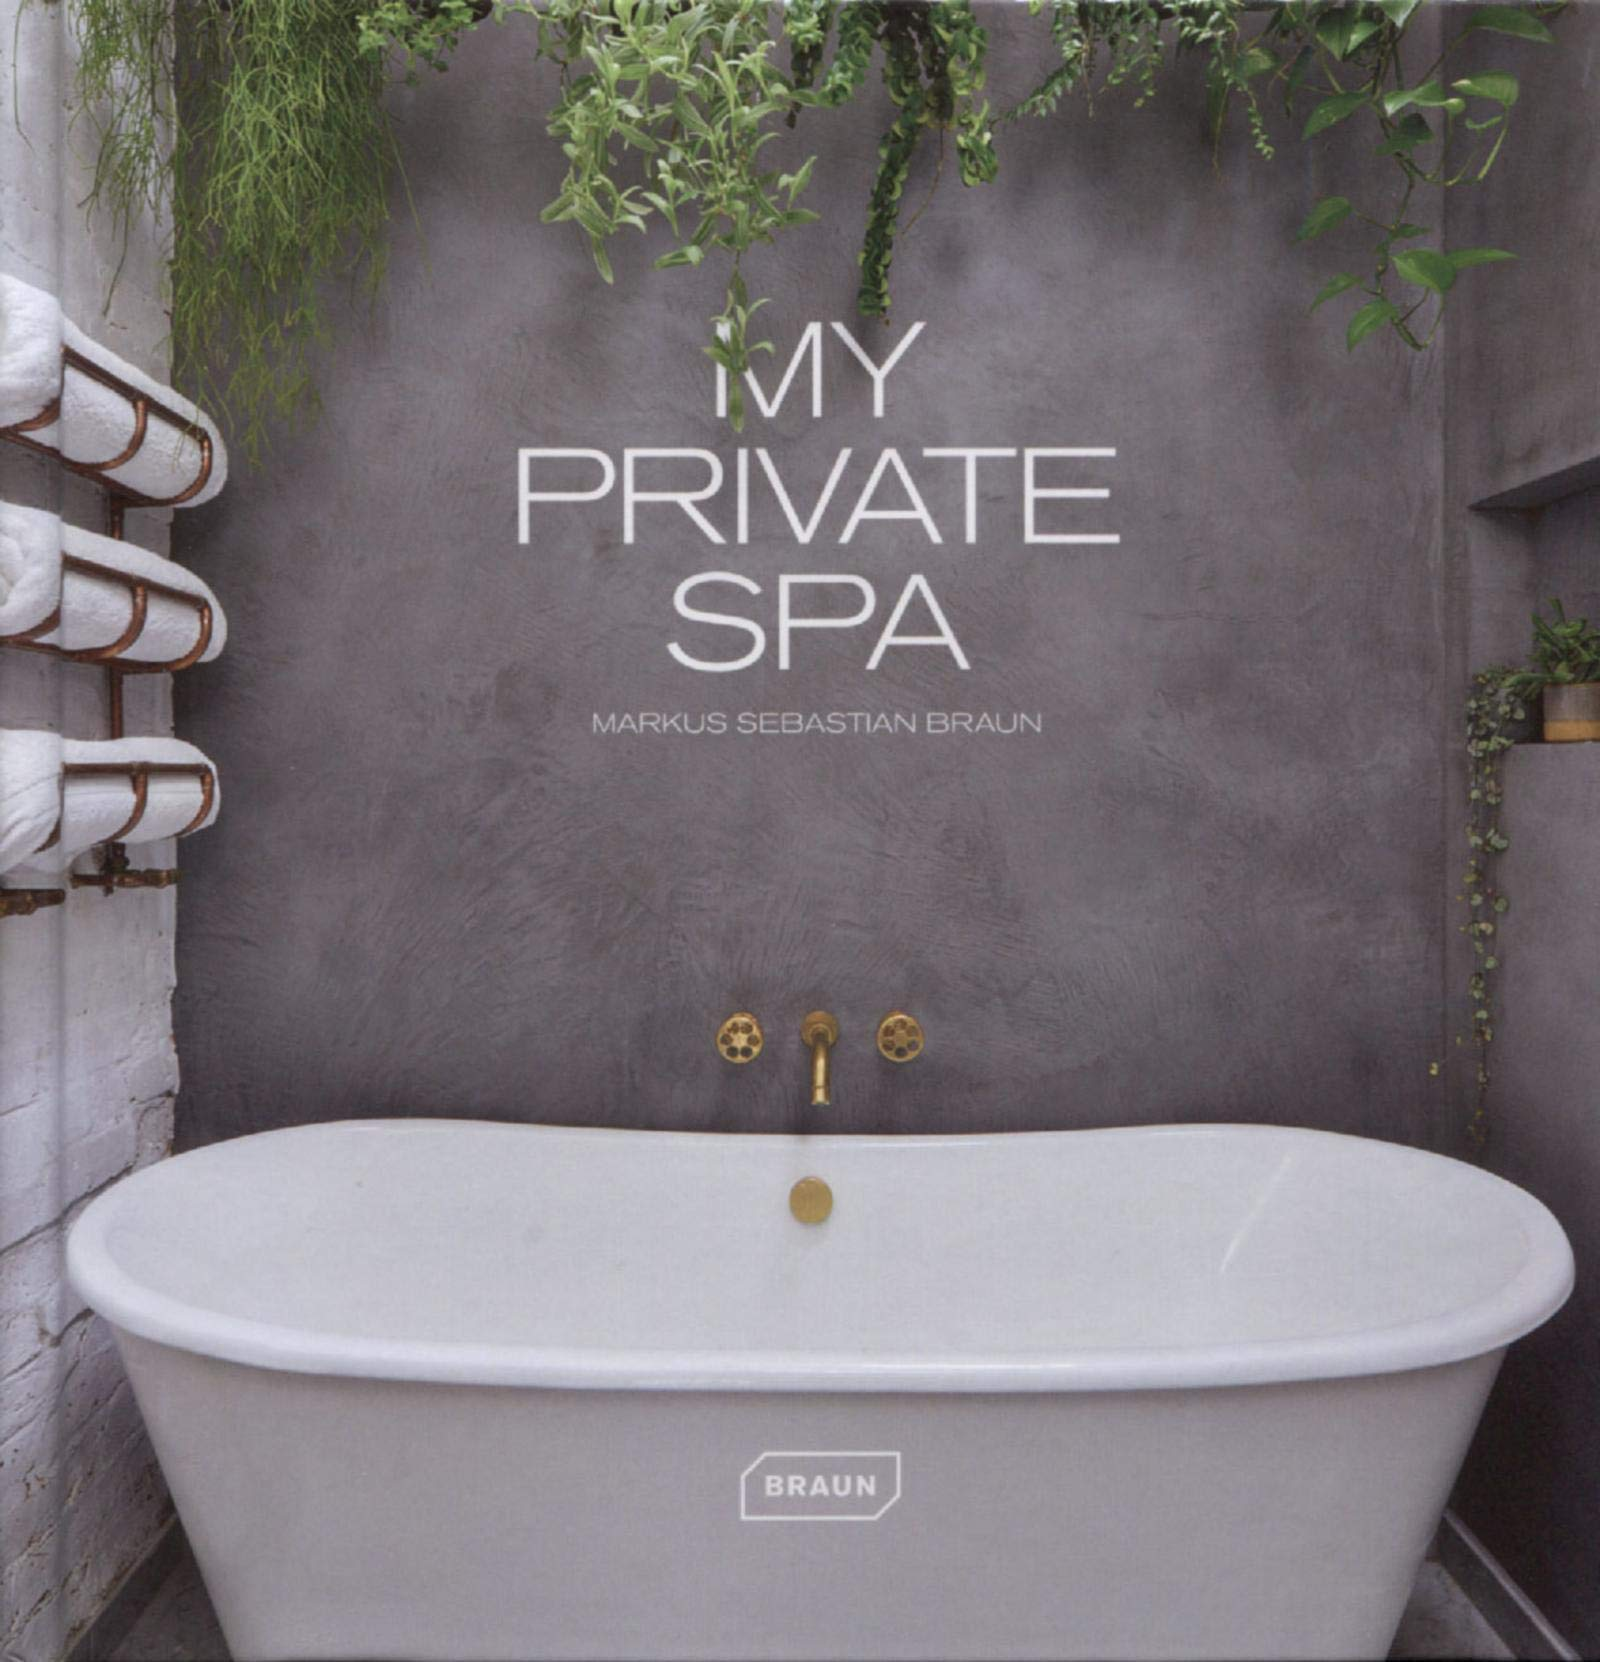 My Private Spa  Braun, Markus Sebastian Amazon.de Bücher